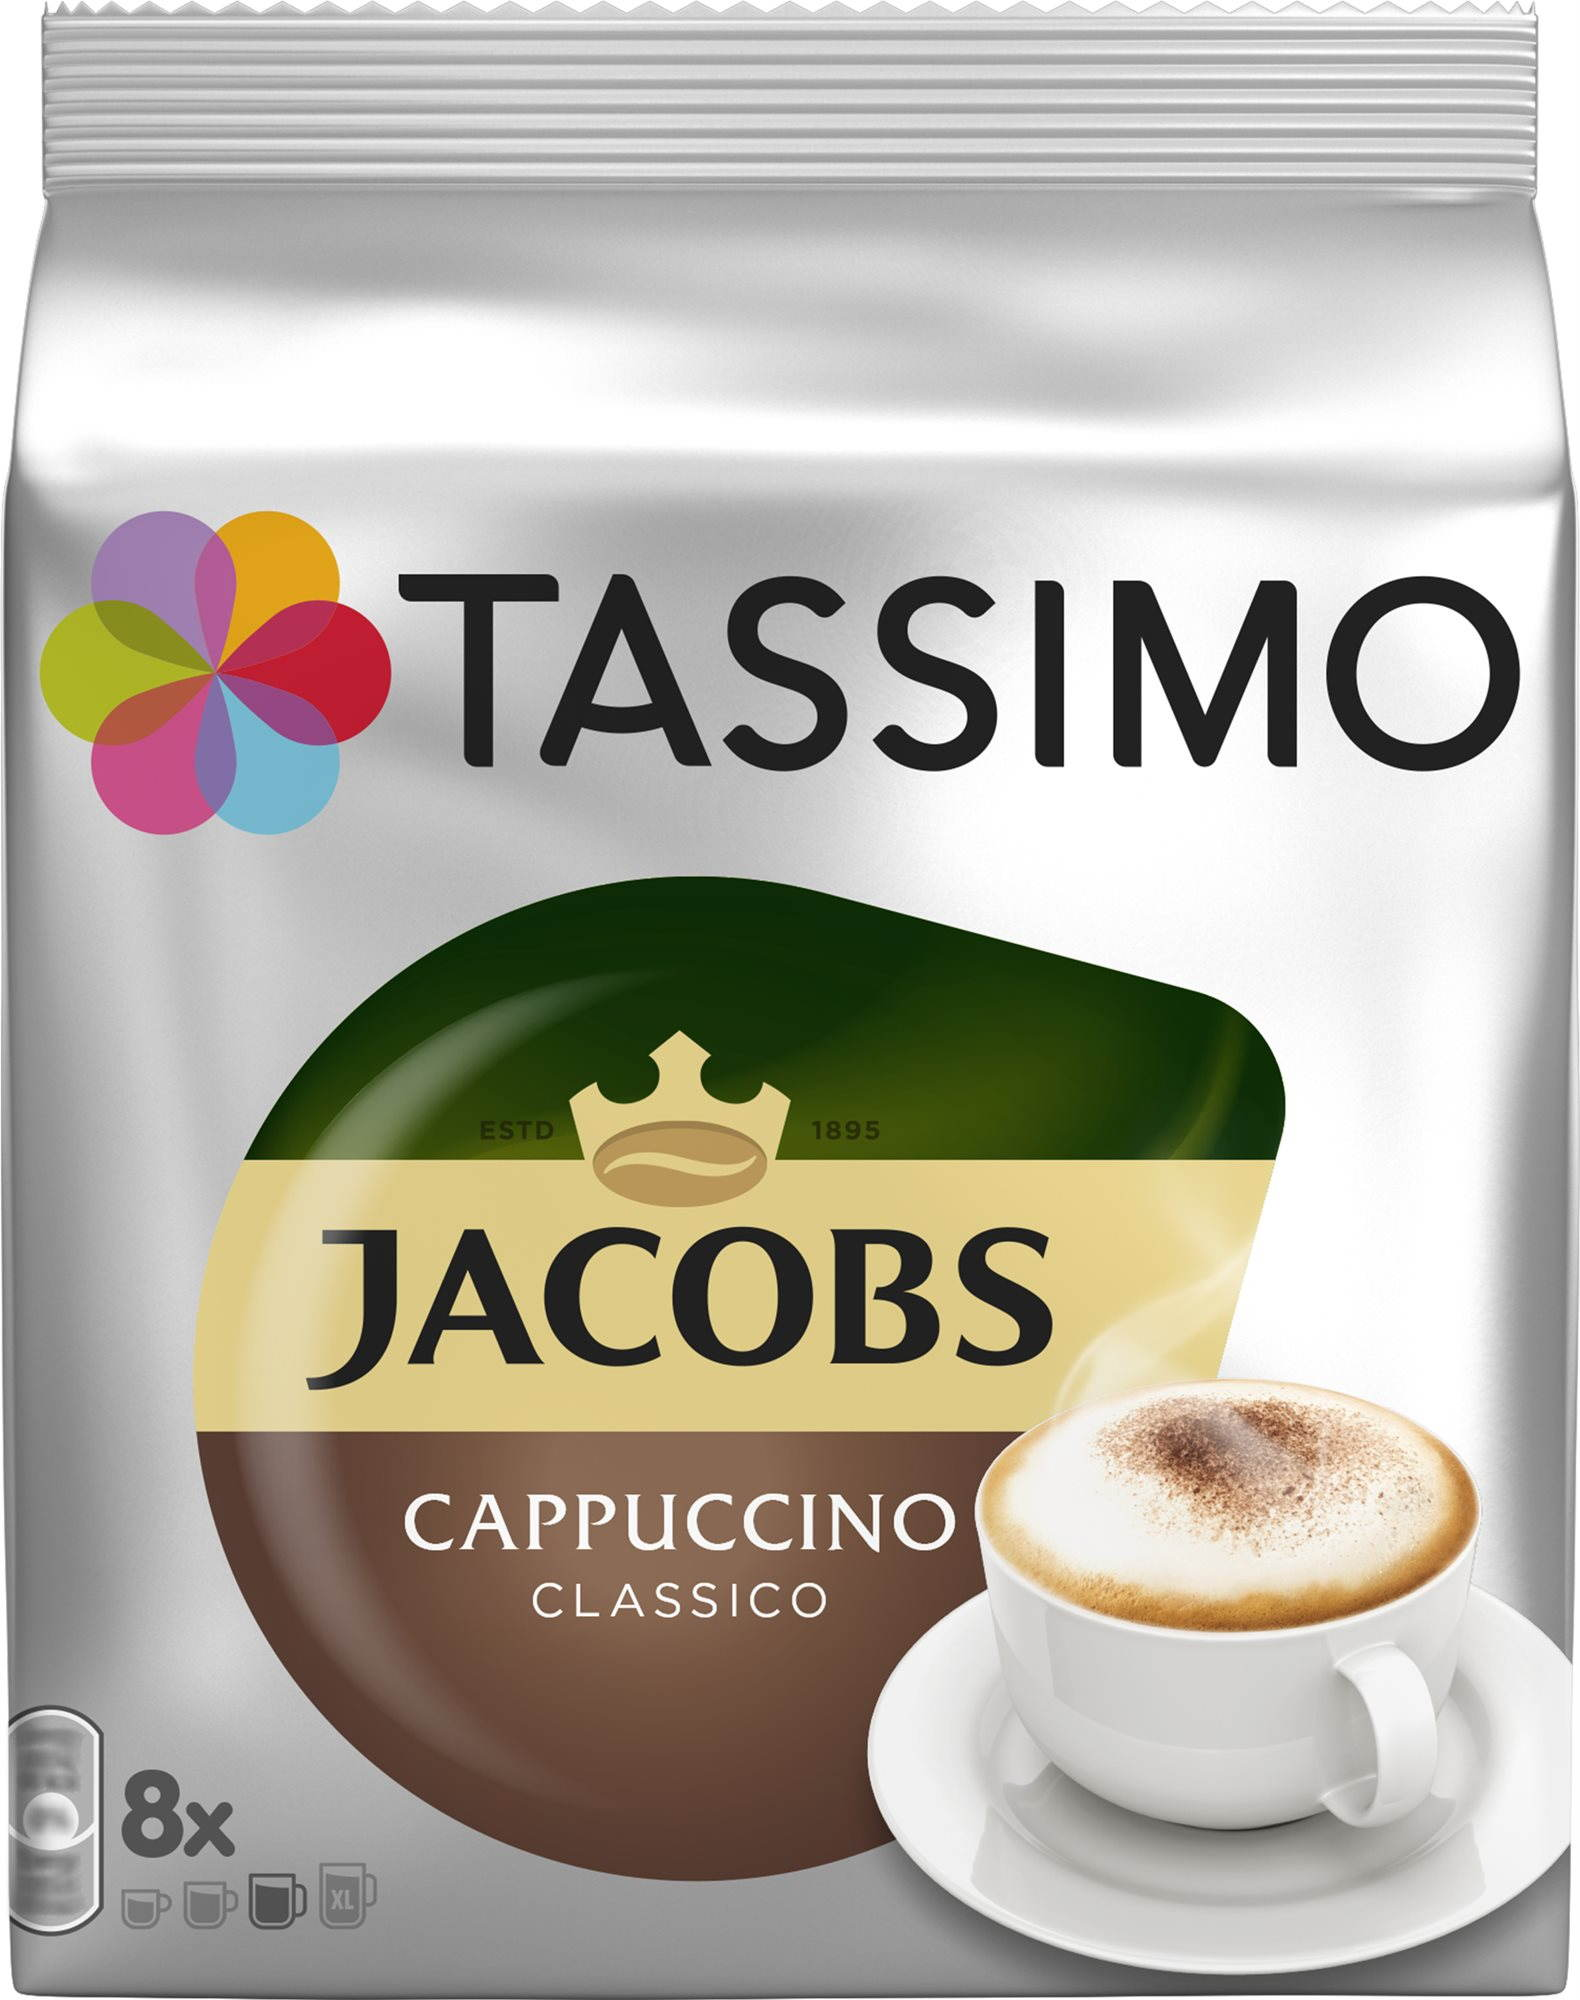 TASSIMO Jacobs Krönung Cappuccino 8 adag